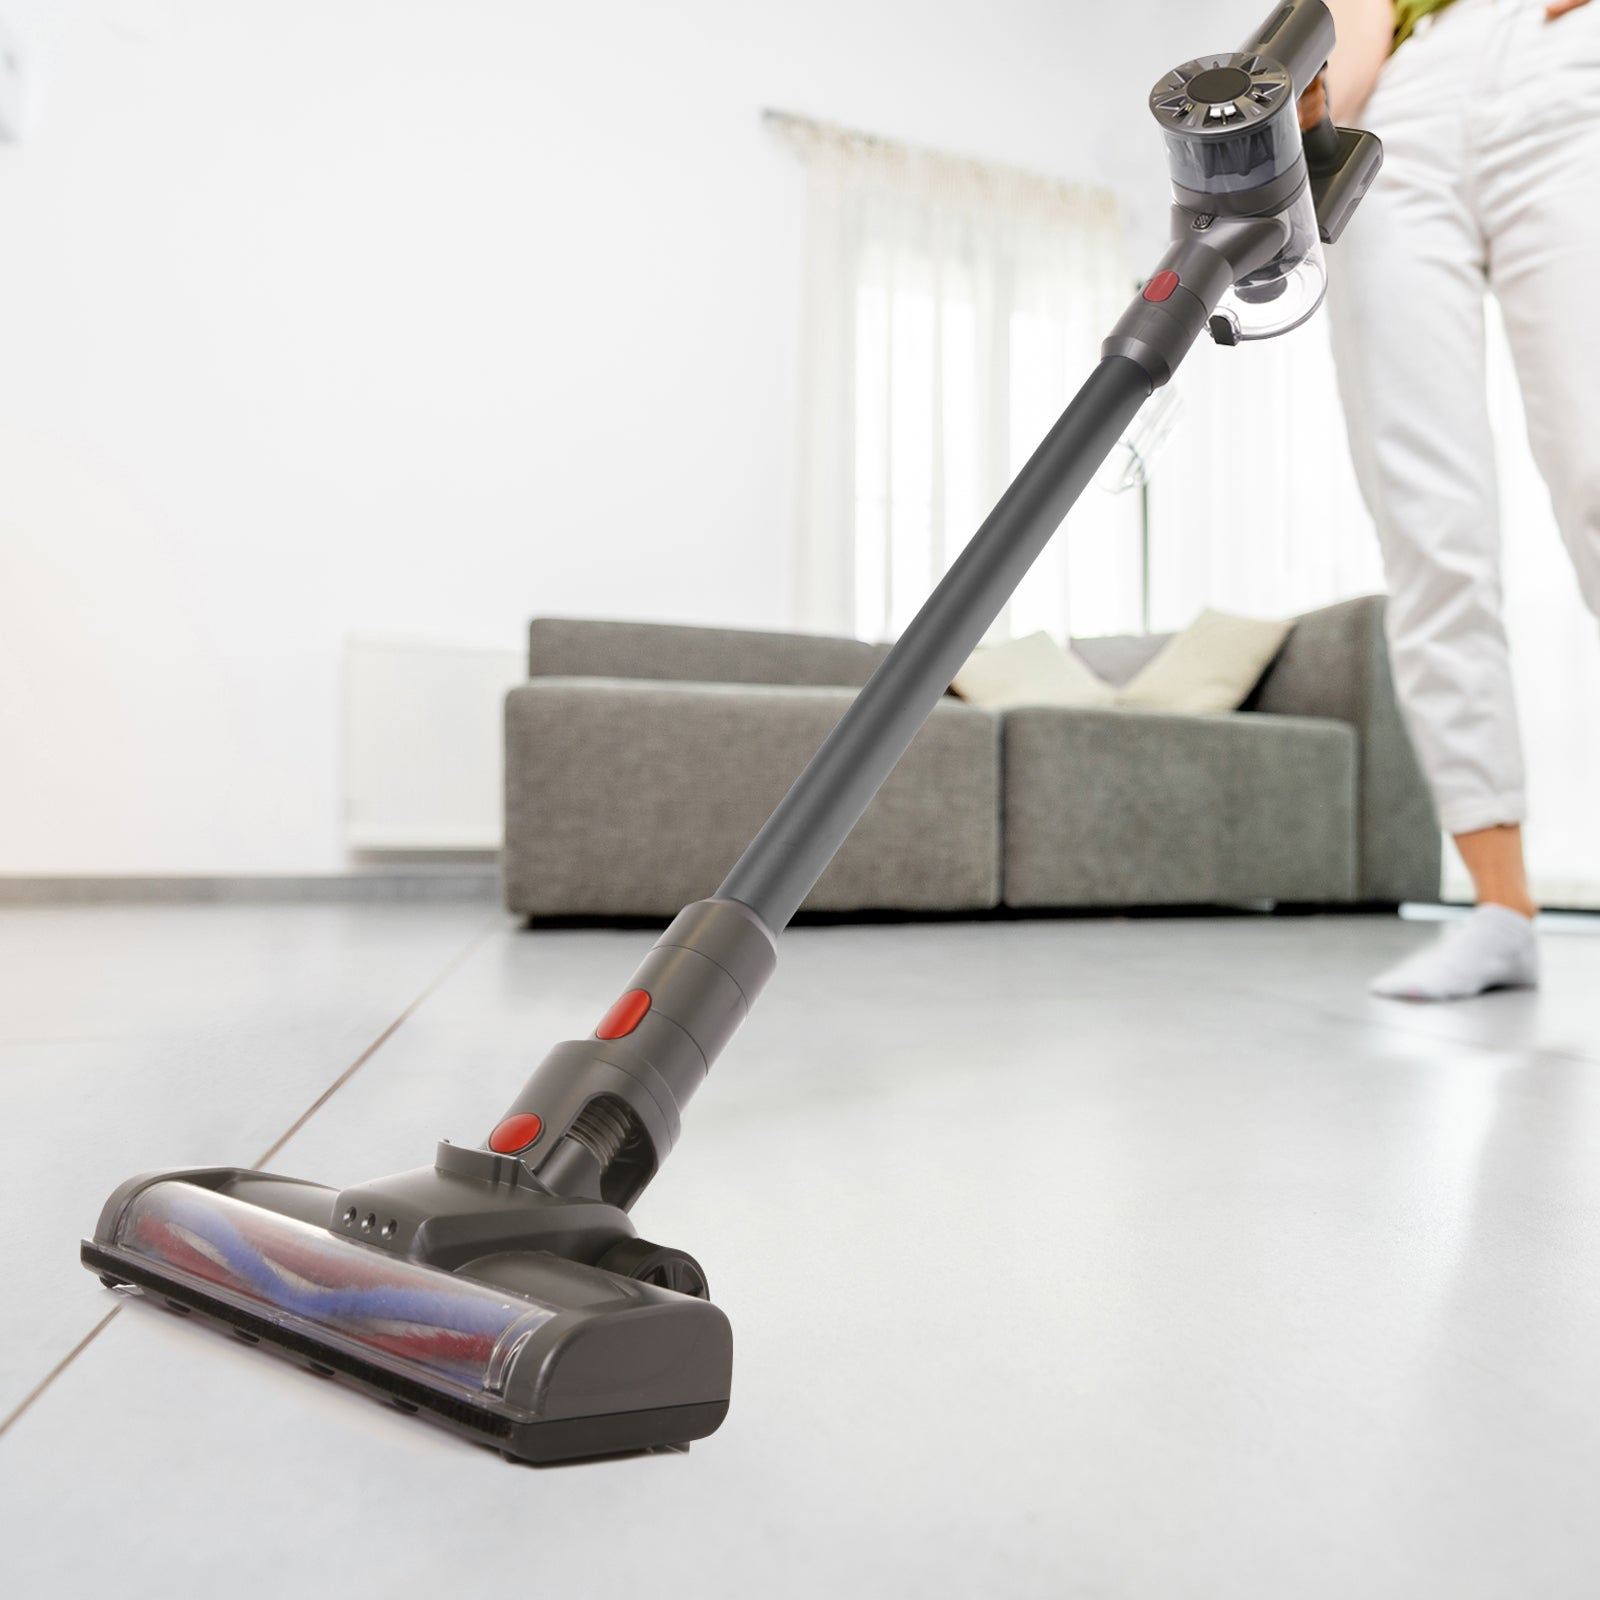 MyGenie X5 Handheld Cordless Stick Handstick Vacuum Bagless Rechargeable